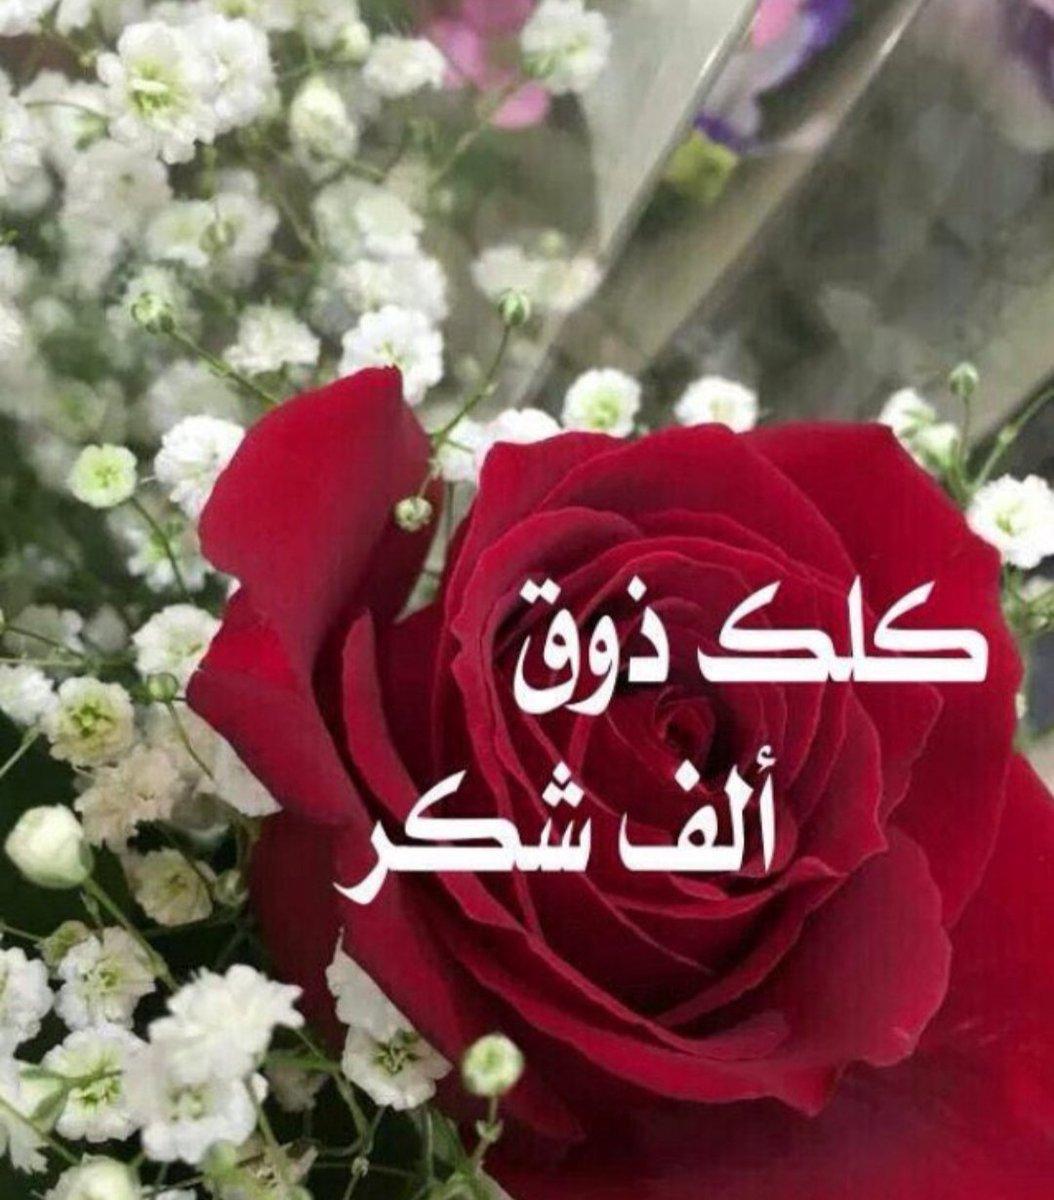 Etiqueta يسلمو En Twitter